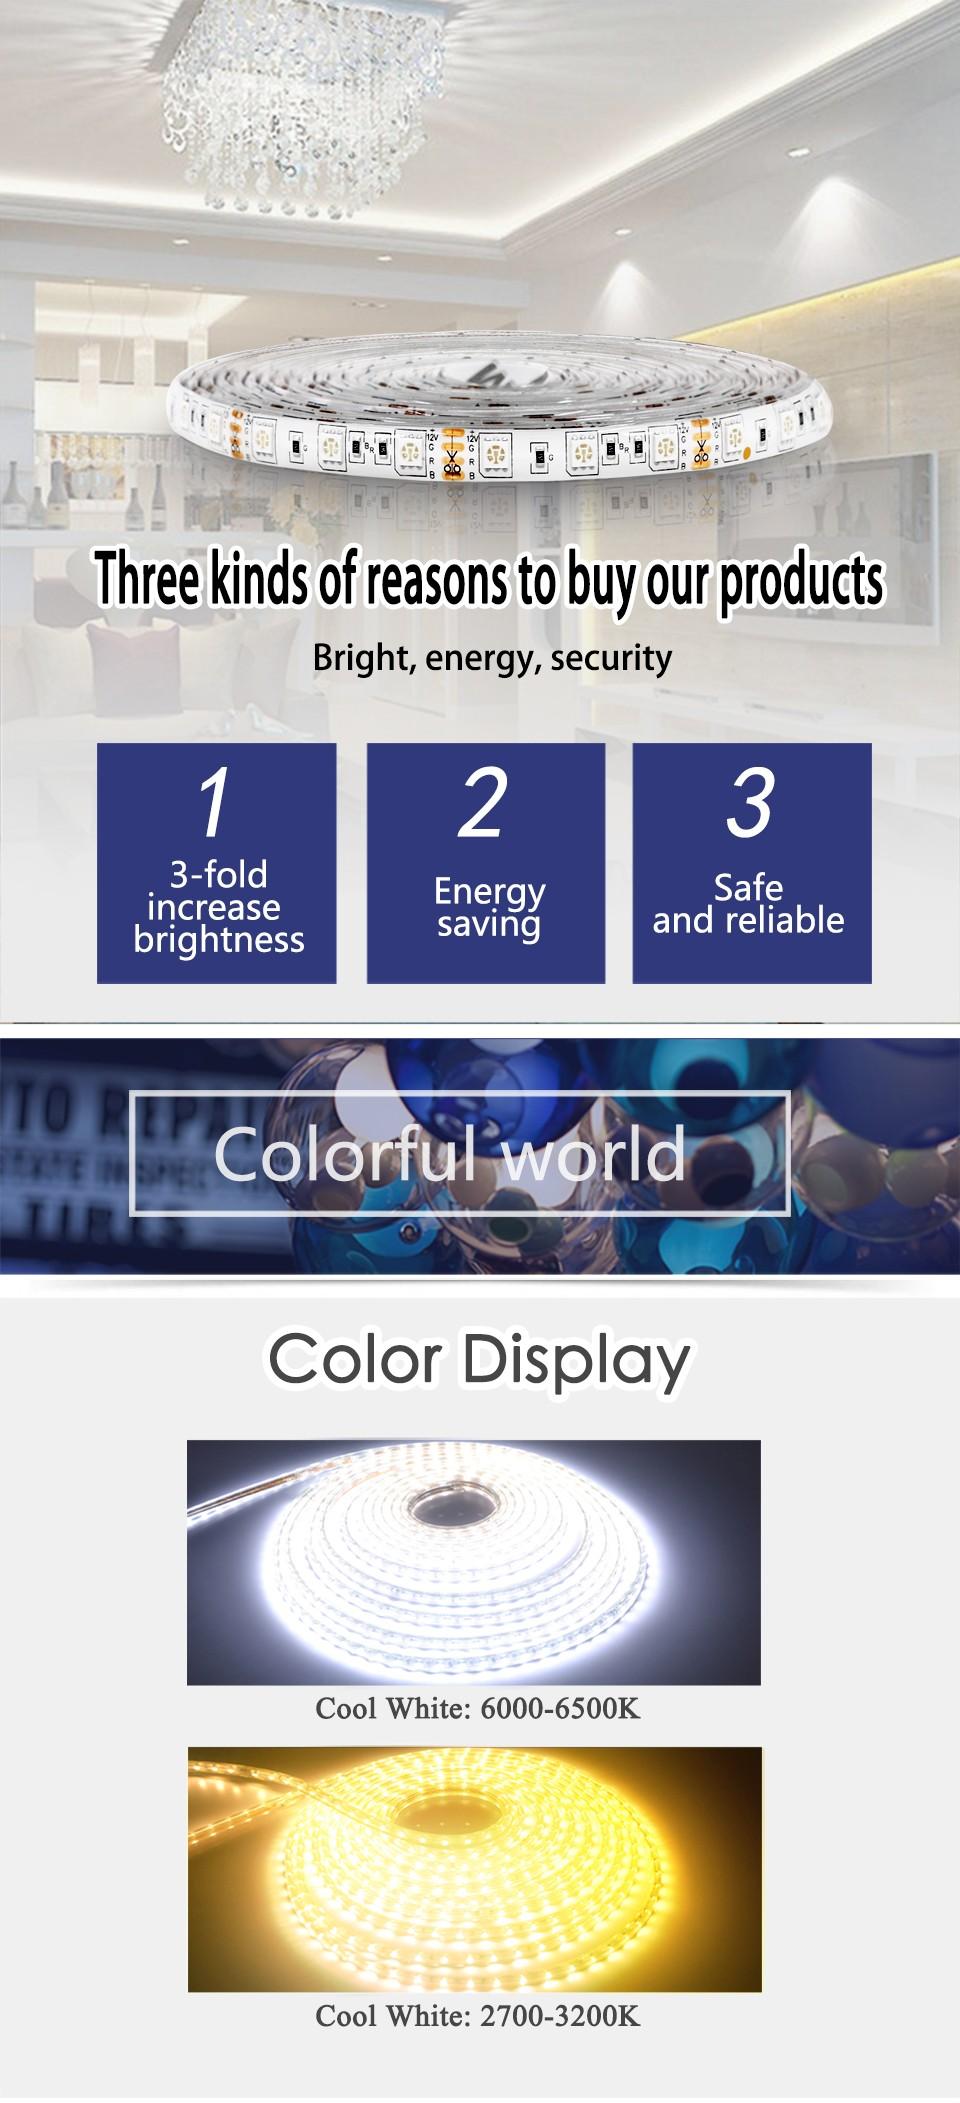 5M LED strip 3528 5050 60pcs/m DC12V LED Light RGB Cold white yellow red green blue Warm white